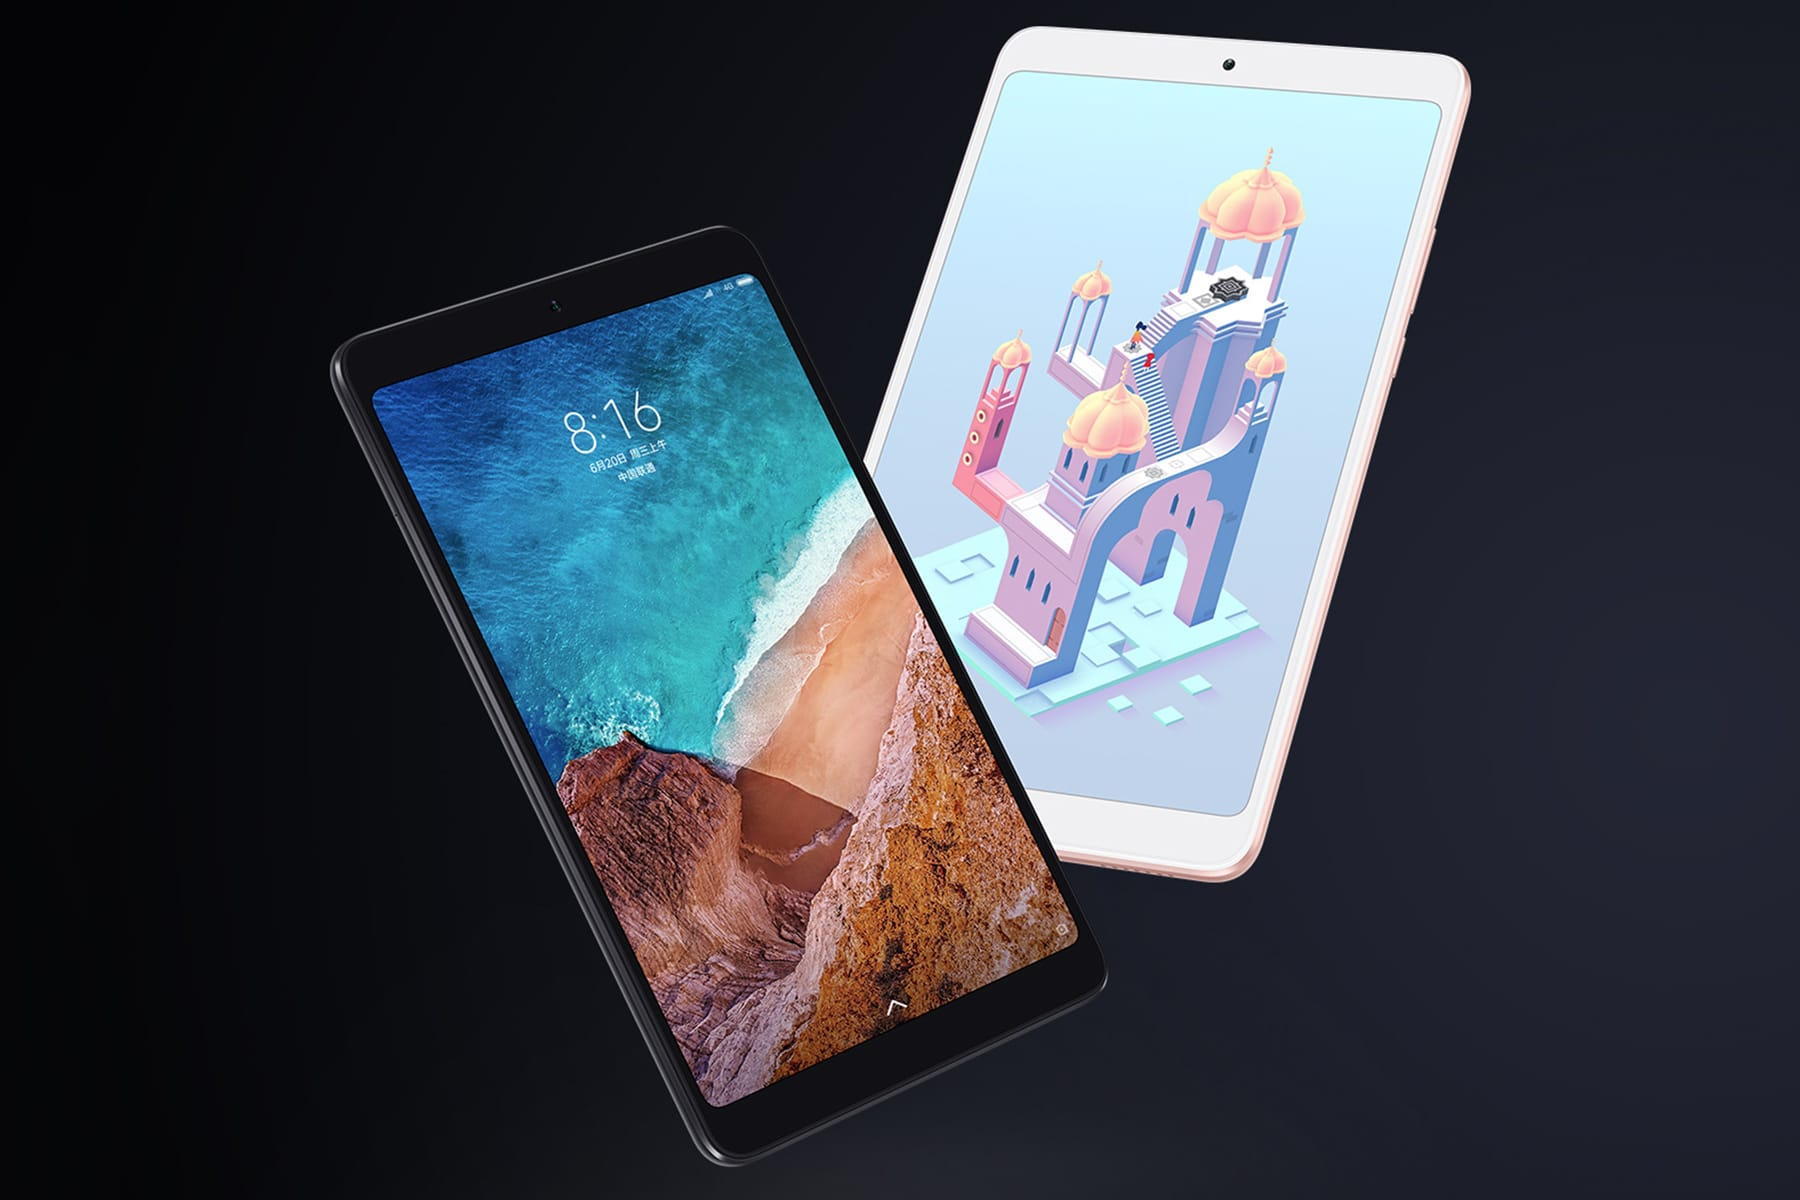 Картинки по запросу Xiaomi Mi Pad 4 Plus новости и фото